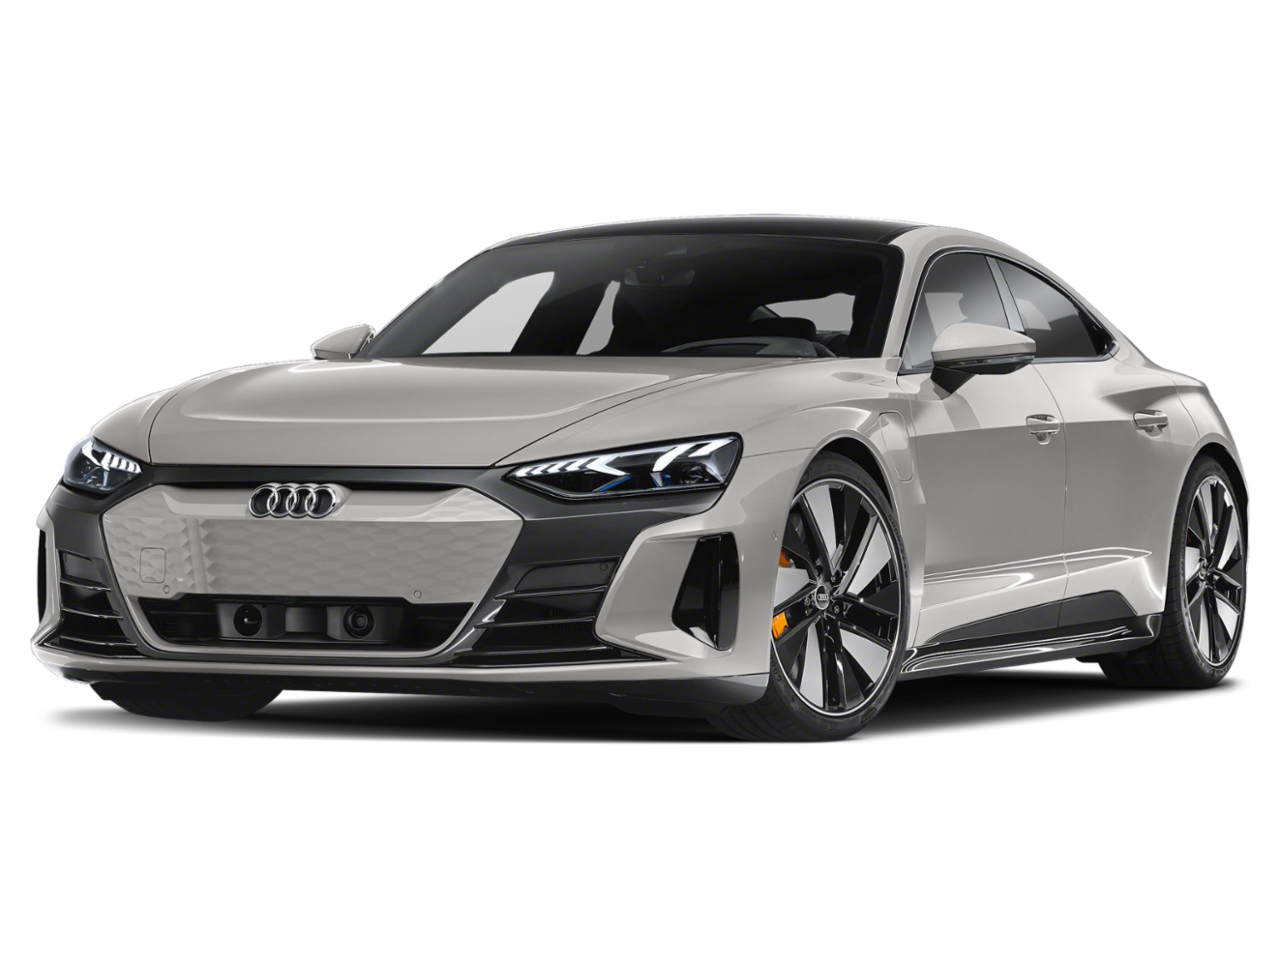 Audi 2022 e-tron GT Premium Plus